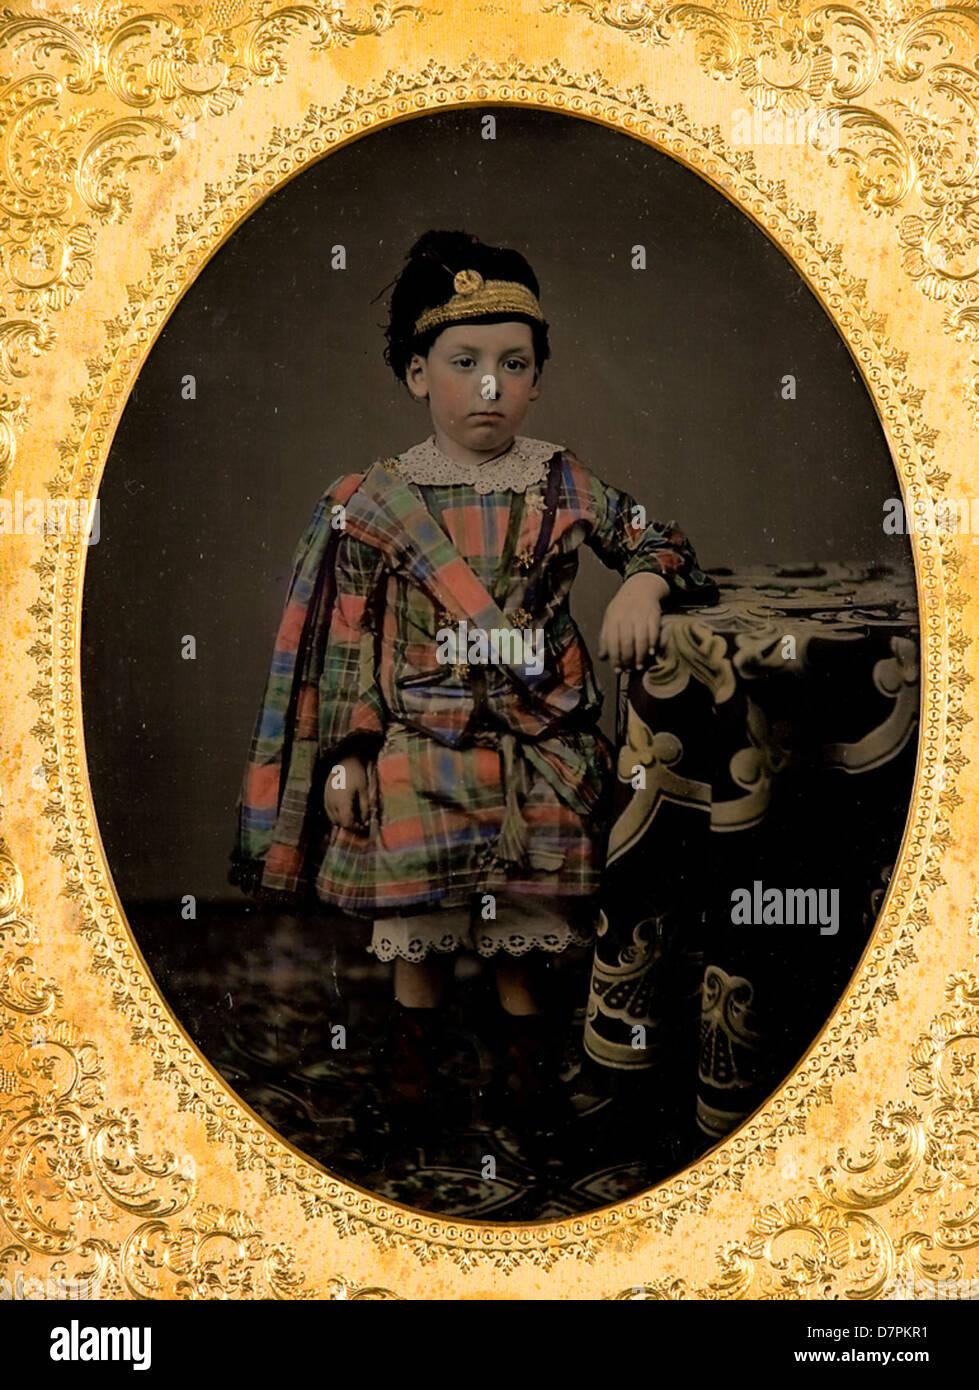 Grand-son of Vice-Admiral Charles John Napier - Stock Image